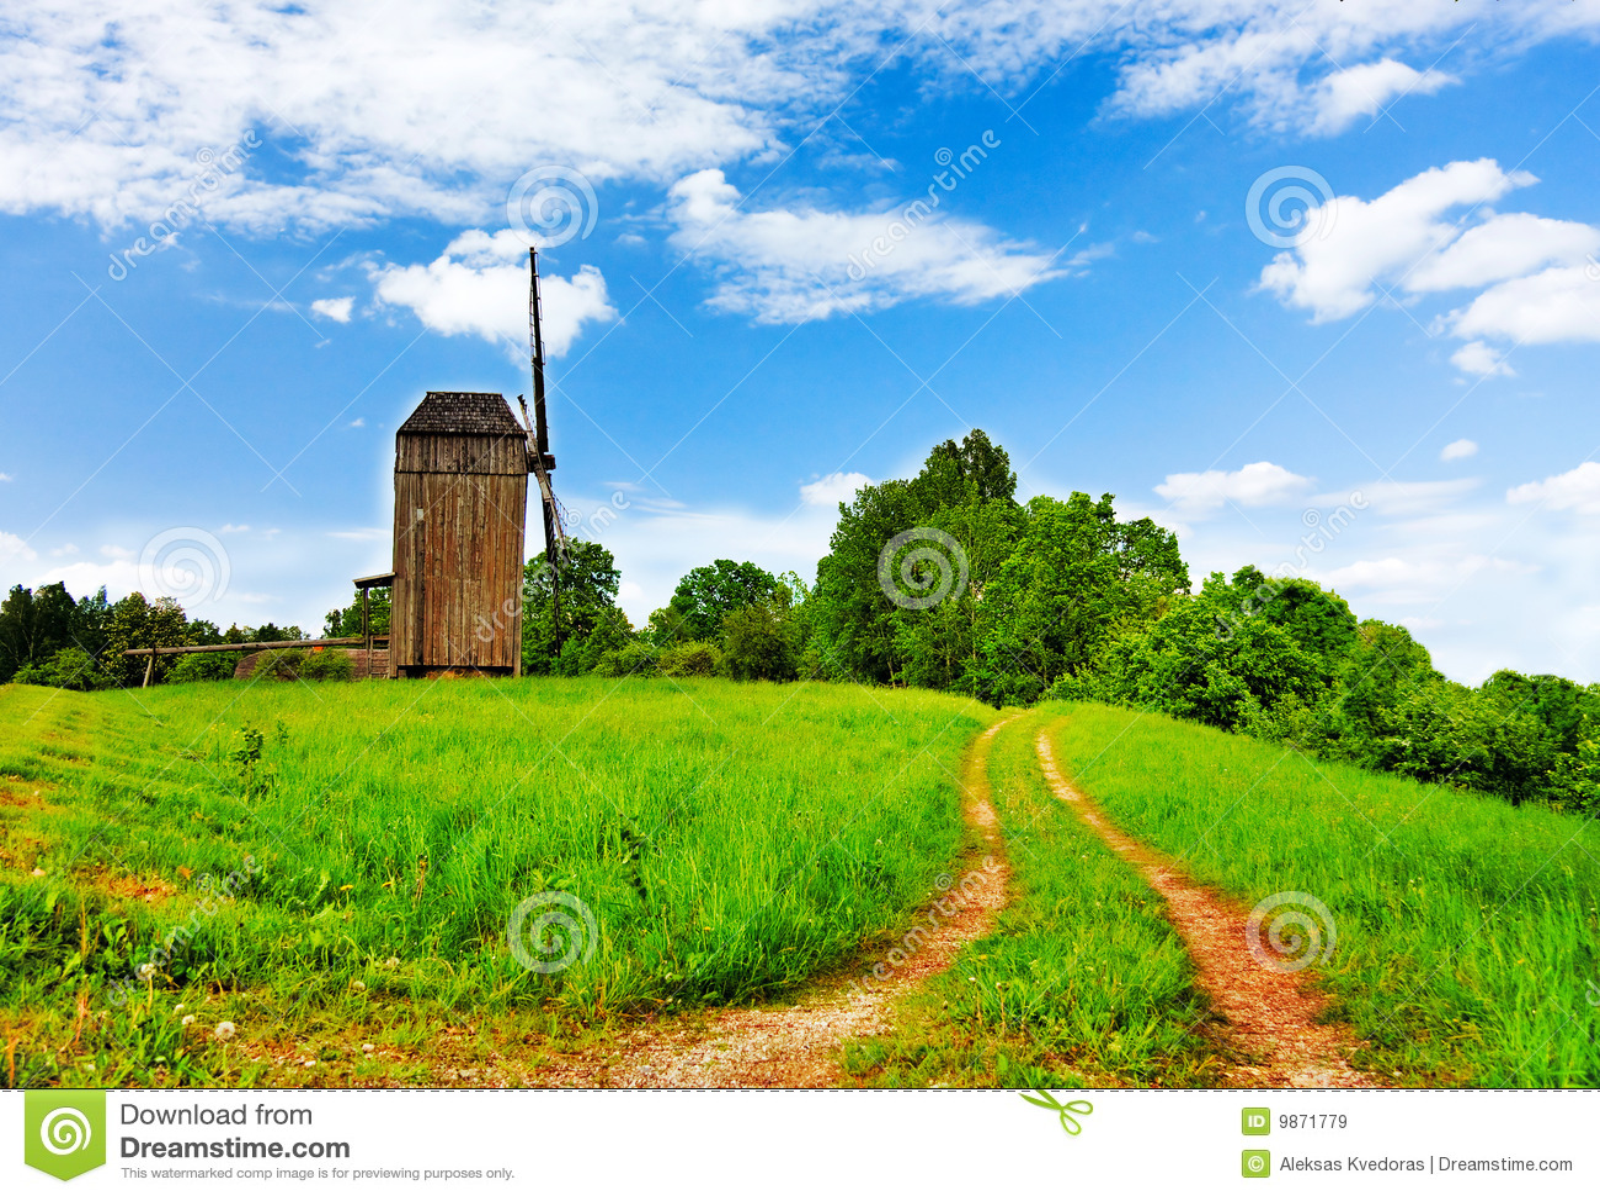 Rural Landscape Royalty Free Stock Images - Image: 9871779